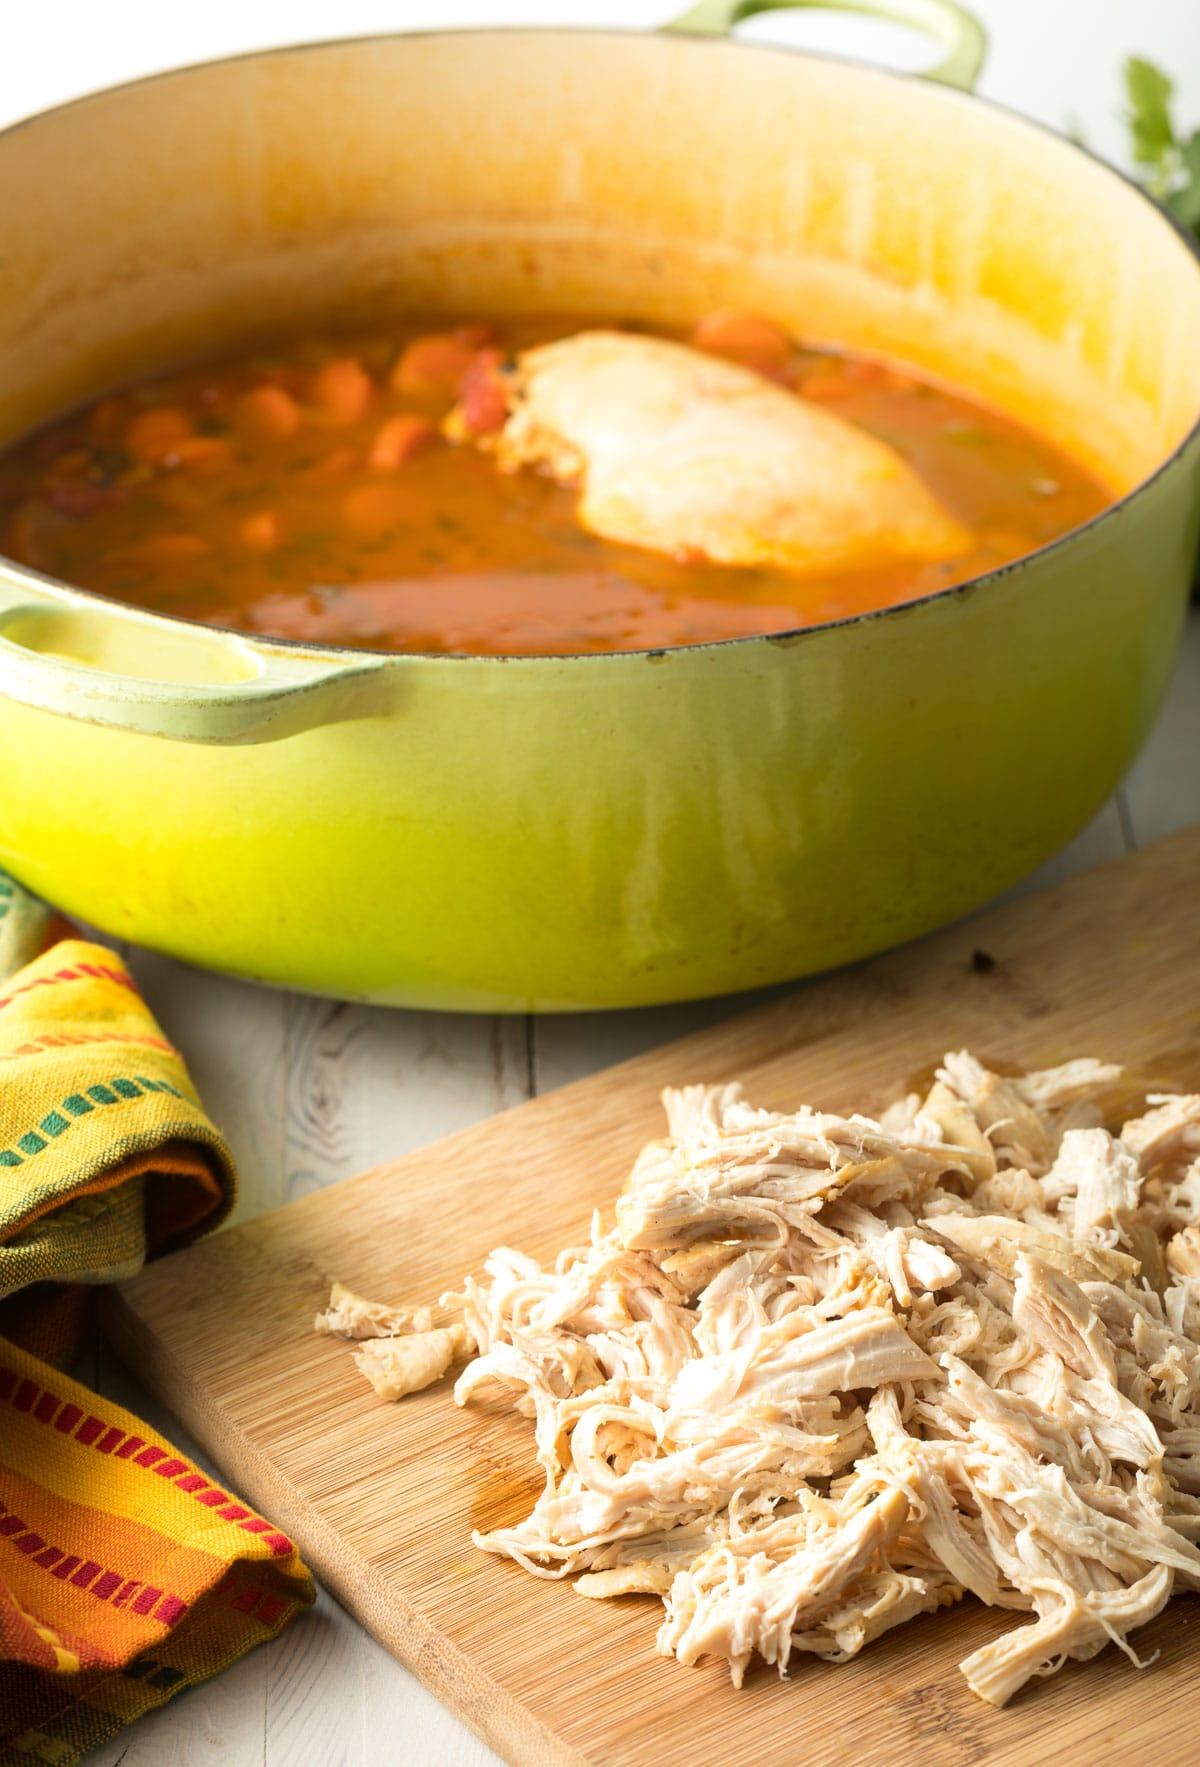 How To Make Easy Chicken Tortilla Soup Recipe #ASpicyPerspective  #instantpot #slowcooker